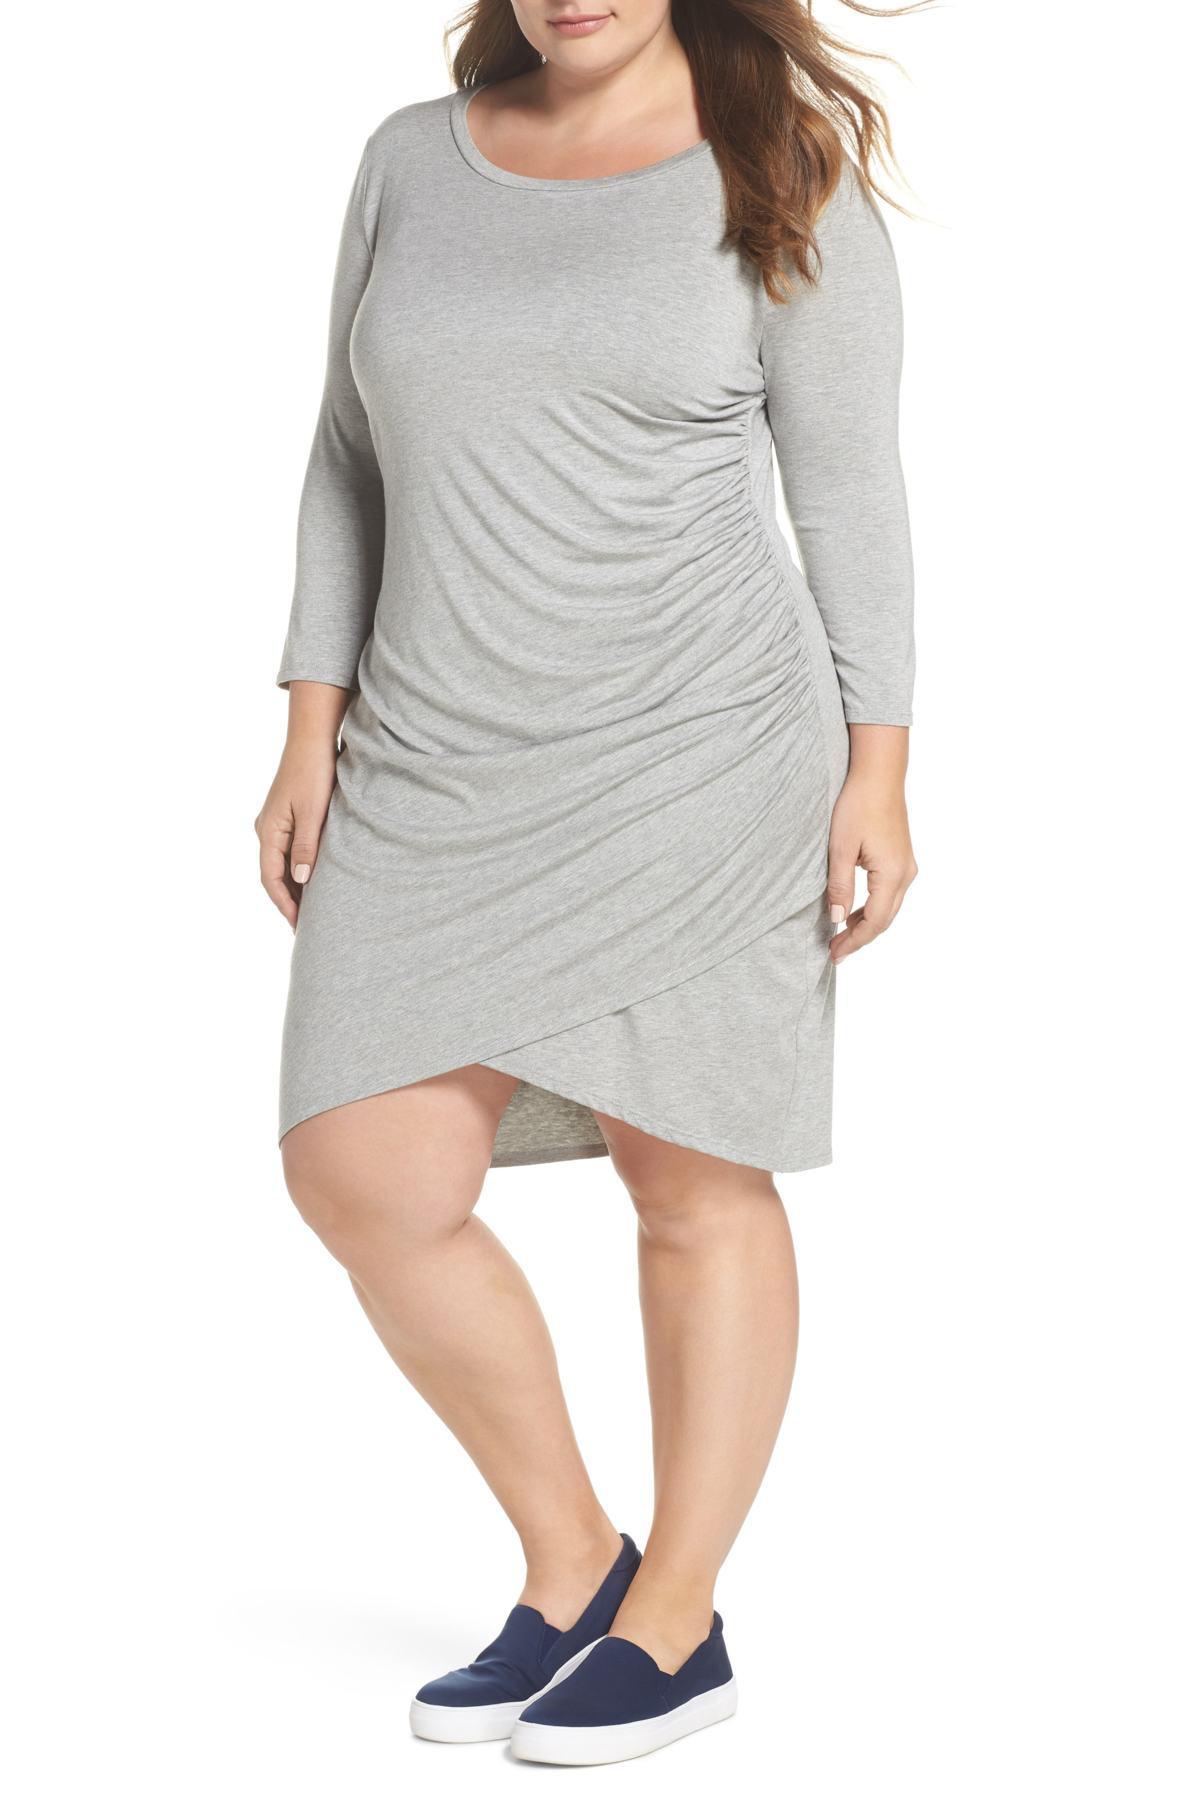 Plus Size Casual Dresses Nordstrom